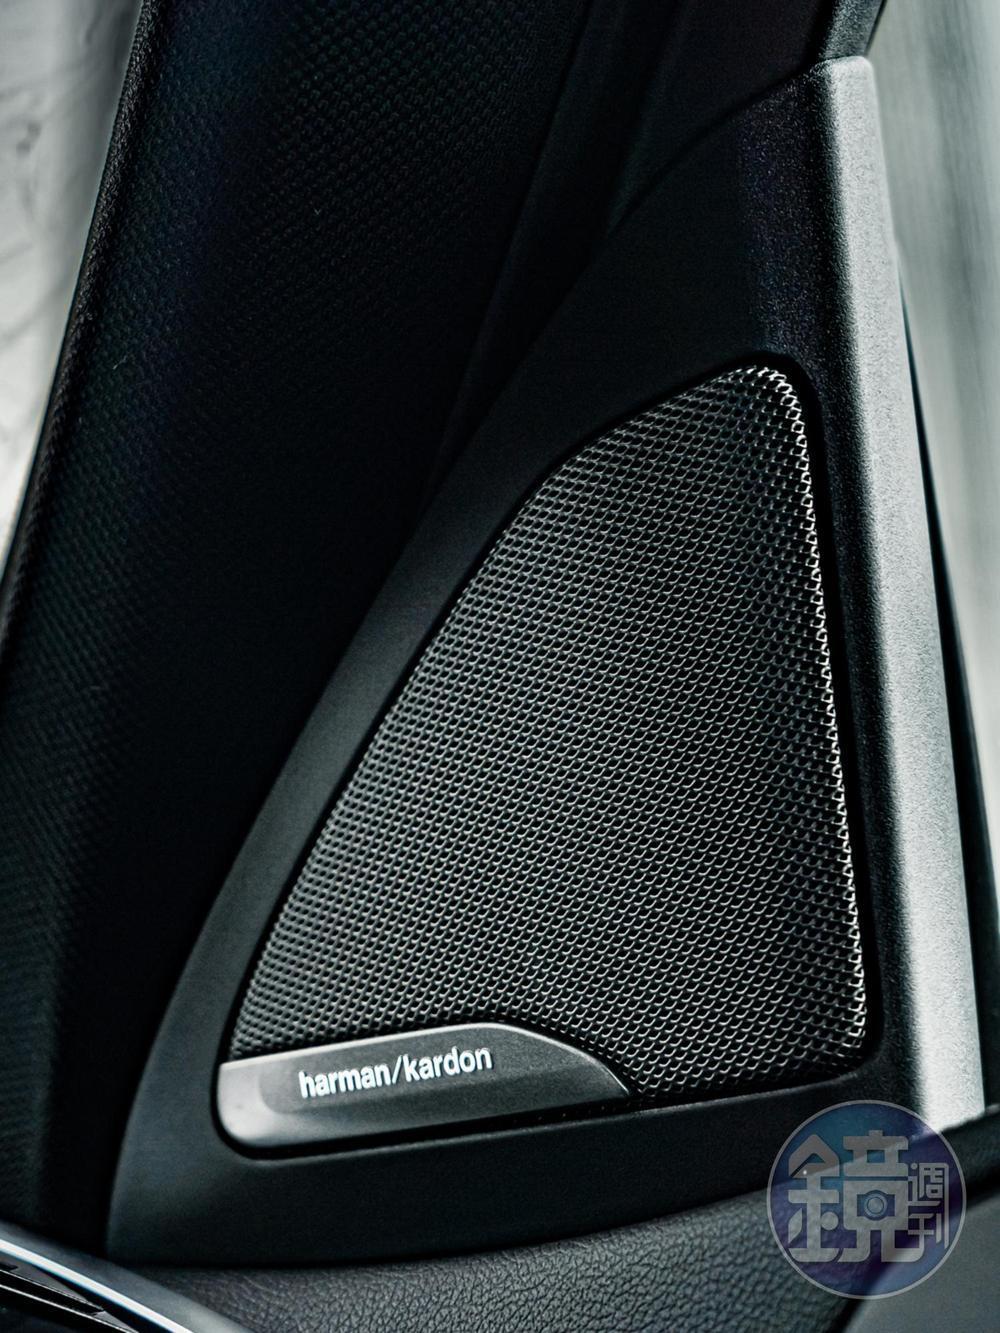 harman/kardon高傳真音響系統含16支揚聲器,能帶給駕乘者無以倫比的聽覺饗宴。